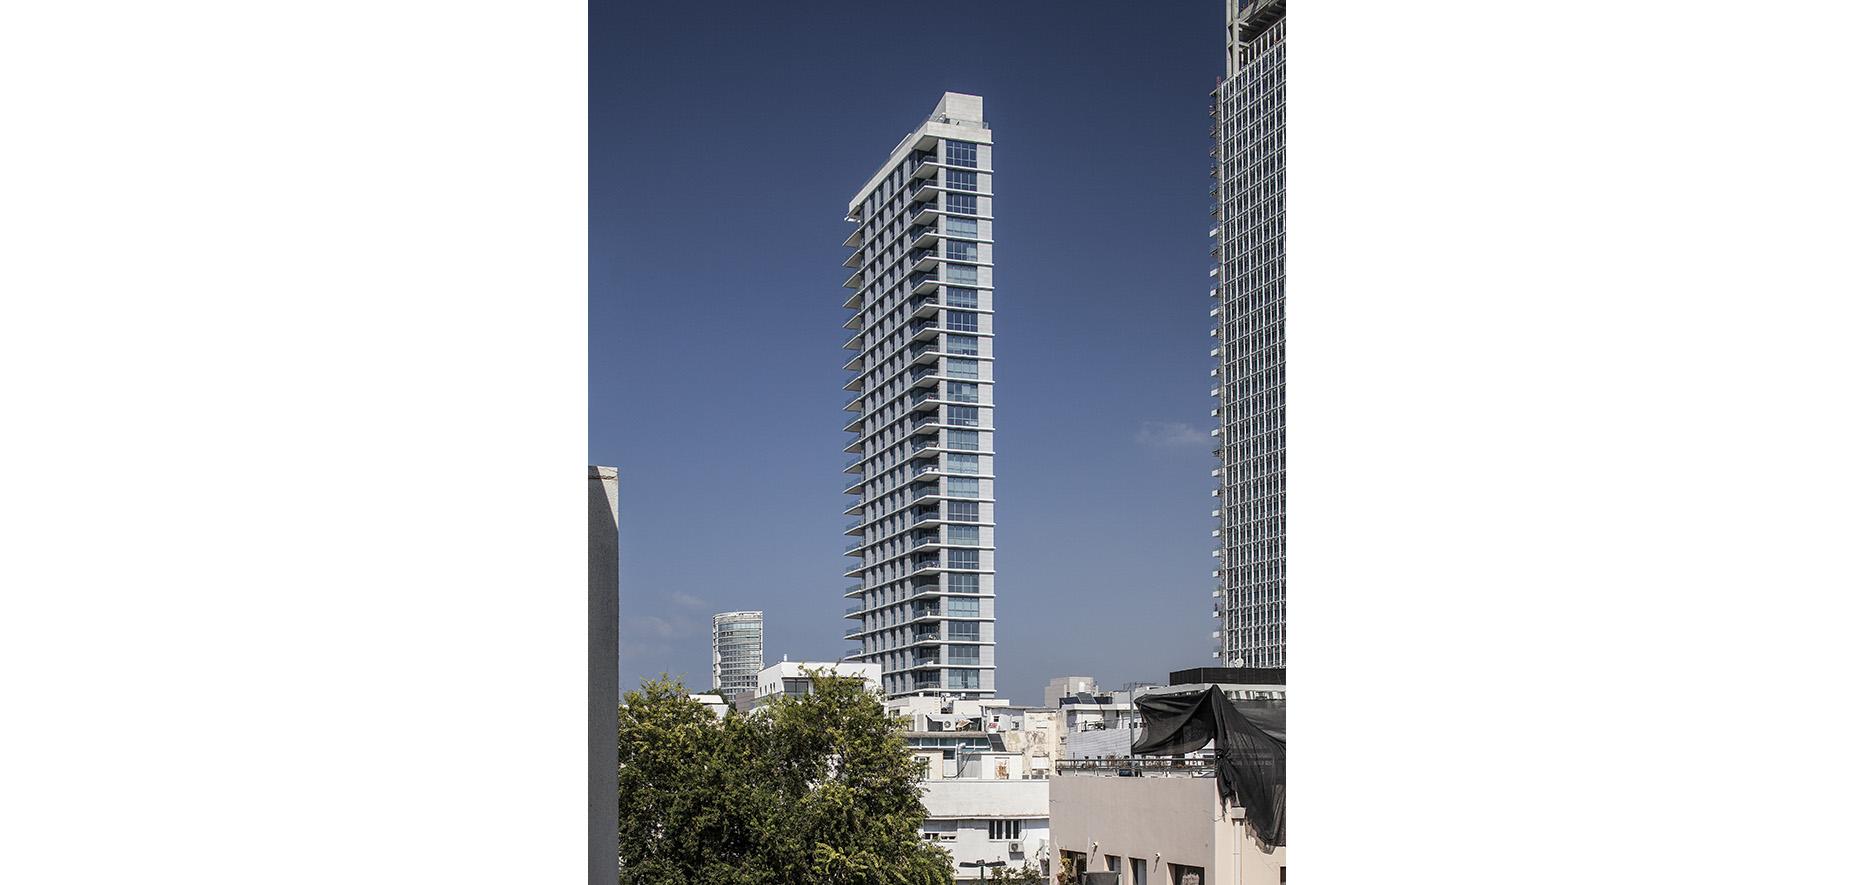 Rothschild_30_Tower_Tel_Aviv_planned_By_Kolker_Epstein_Architects4